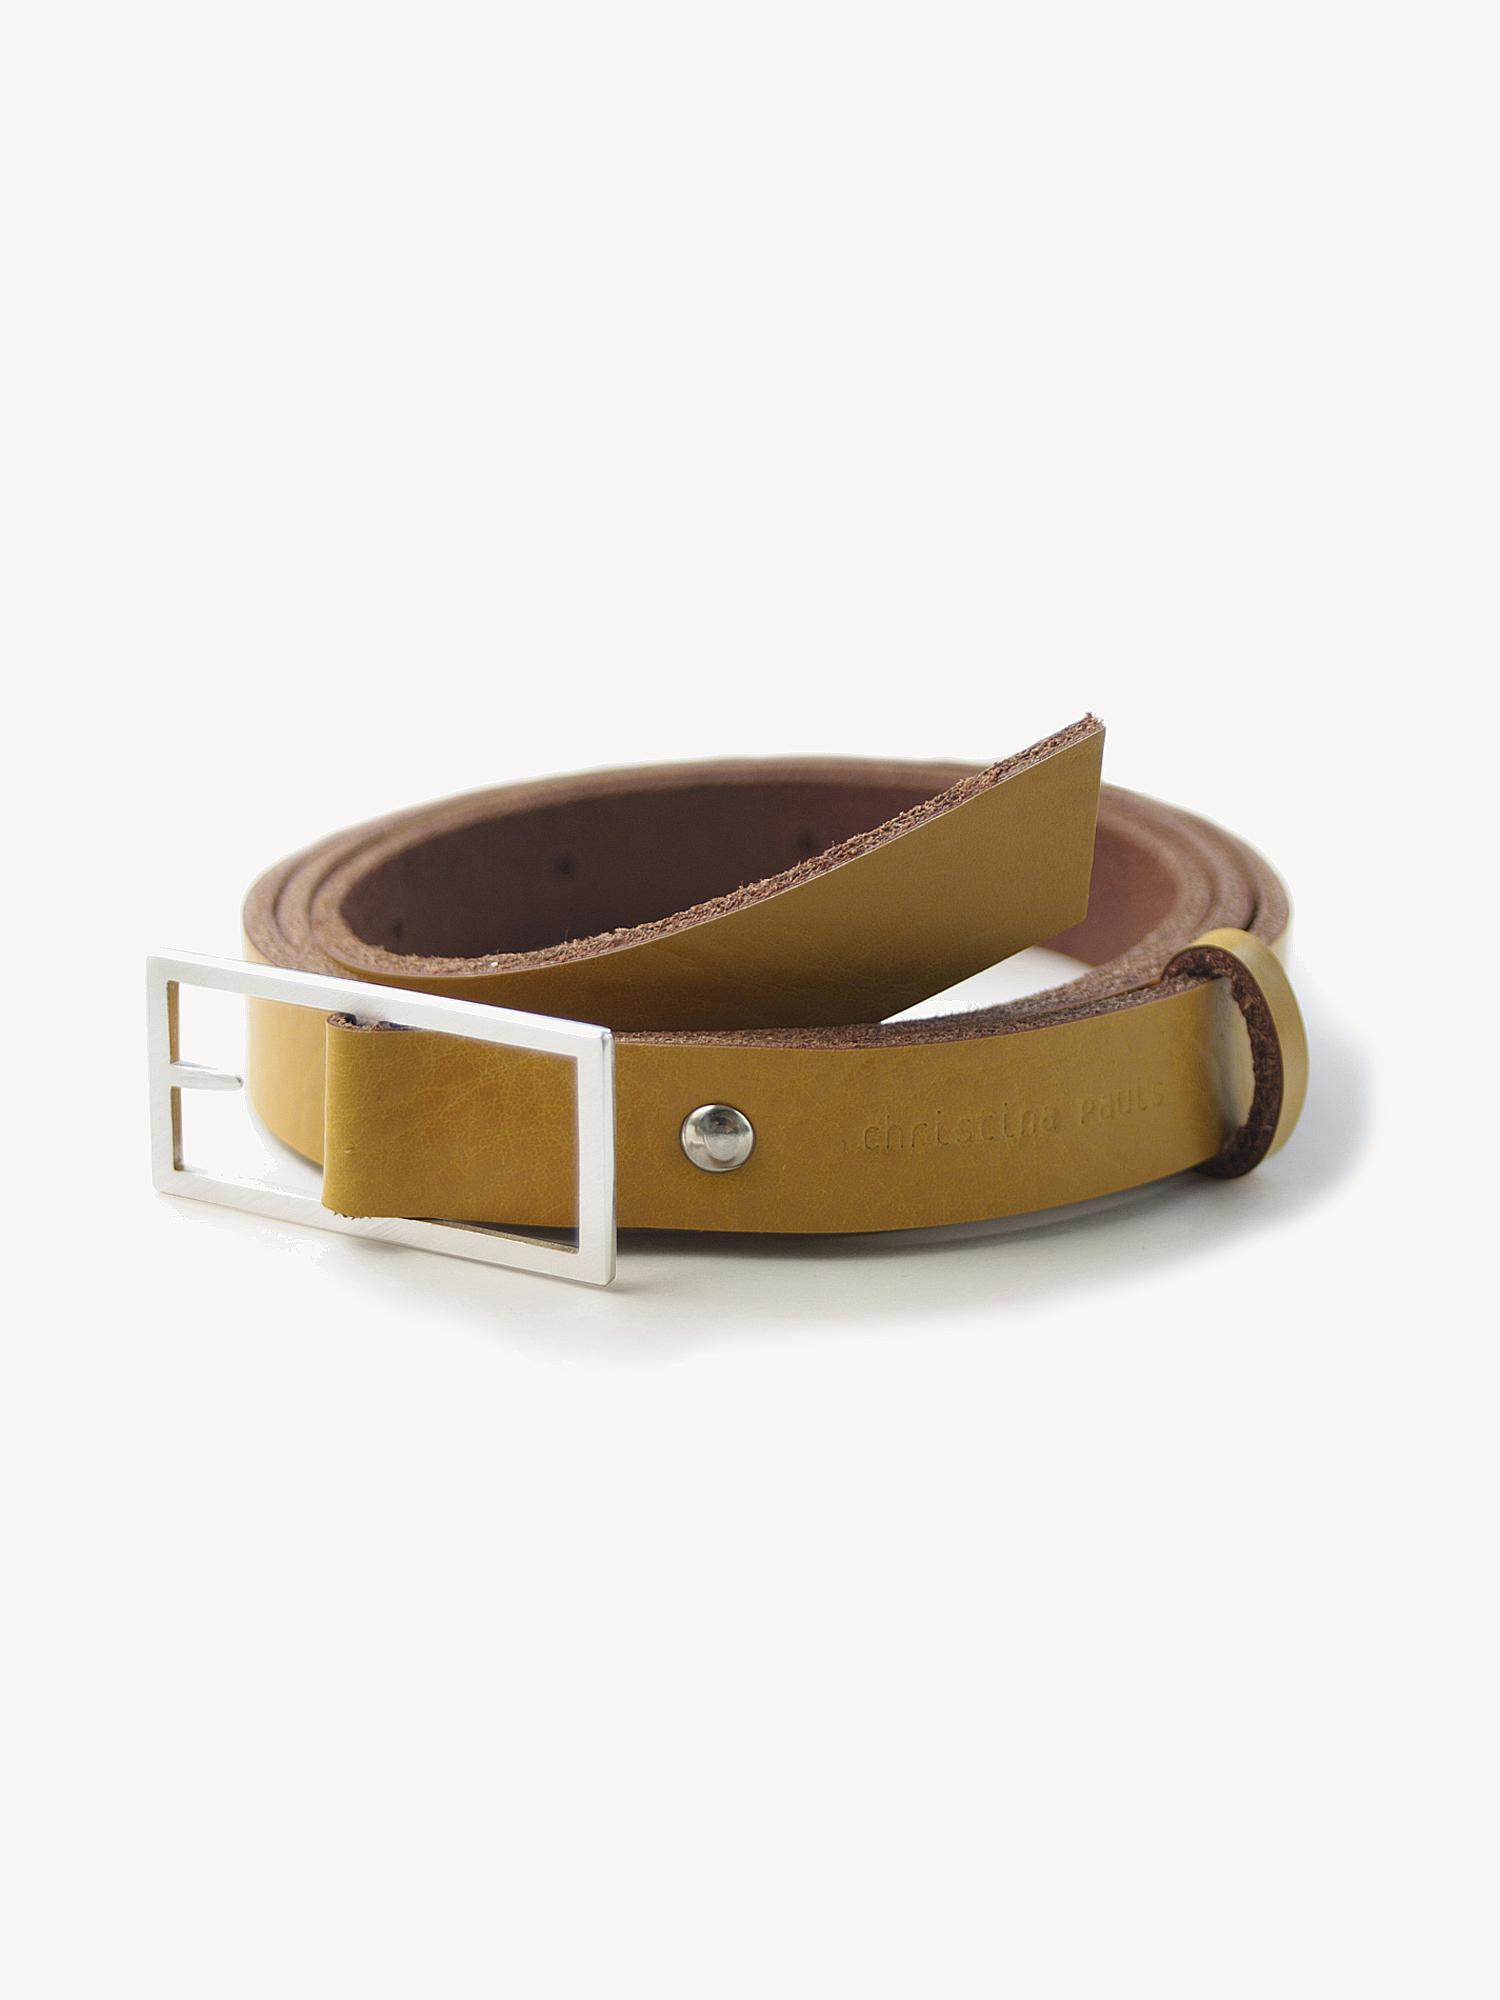 Leder-Gürtel, mittel in senfgelb  Leather belt, medium in curry